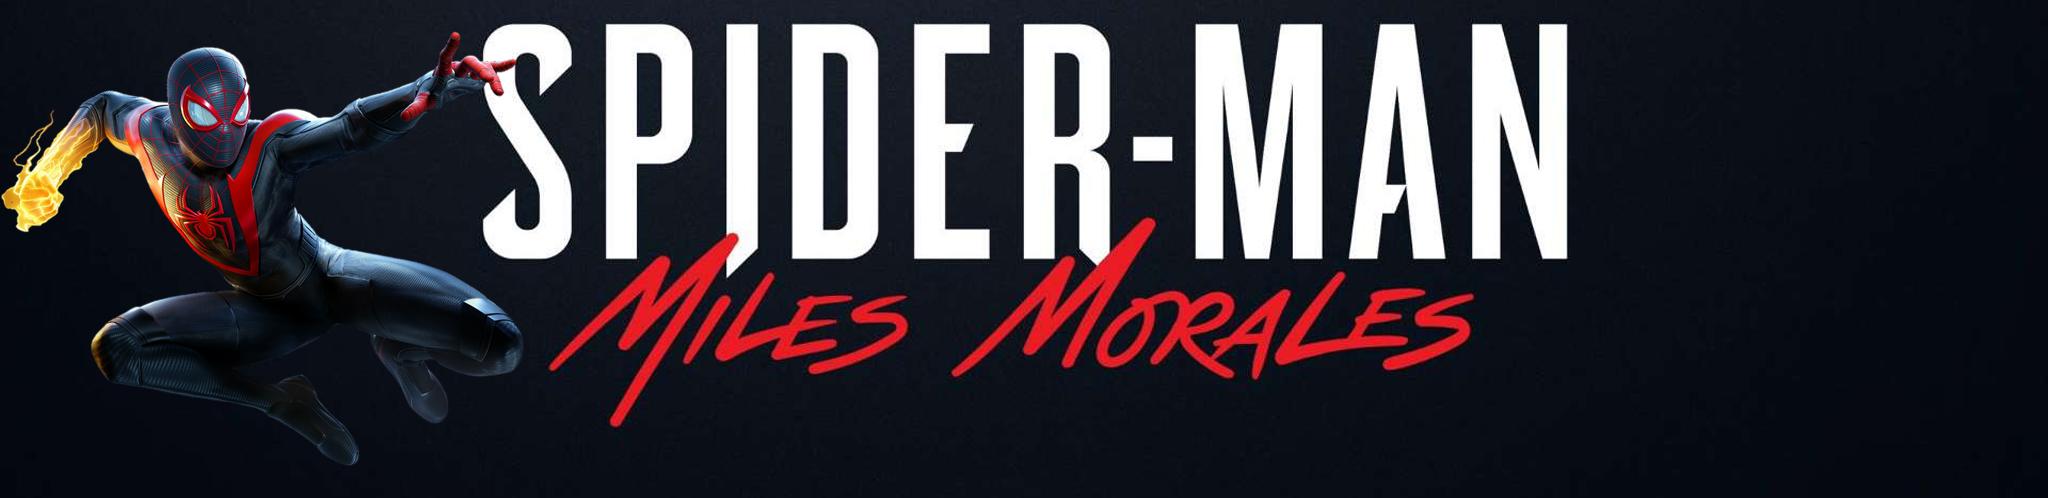 Spider man Milles Morales PS4